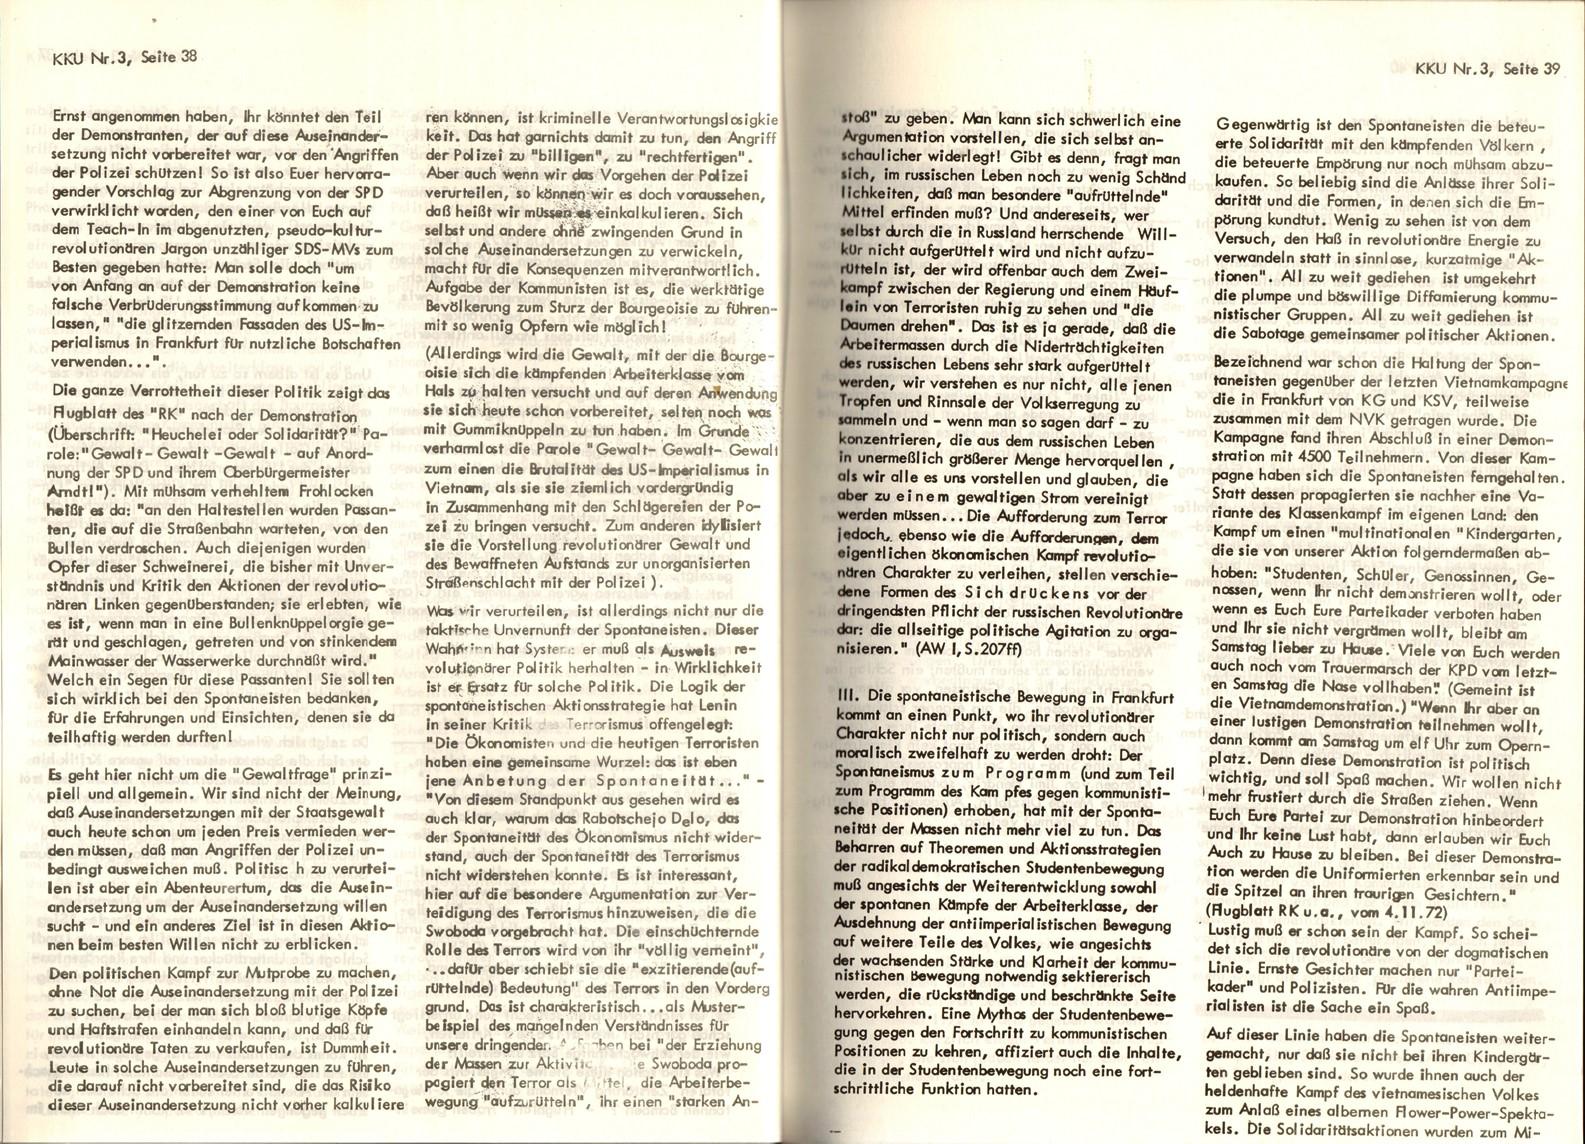 Frankfurt_Offenbach_KG_Kampf_Kritik_Umgestaltung_1973_03_21